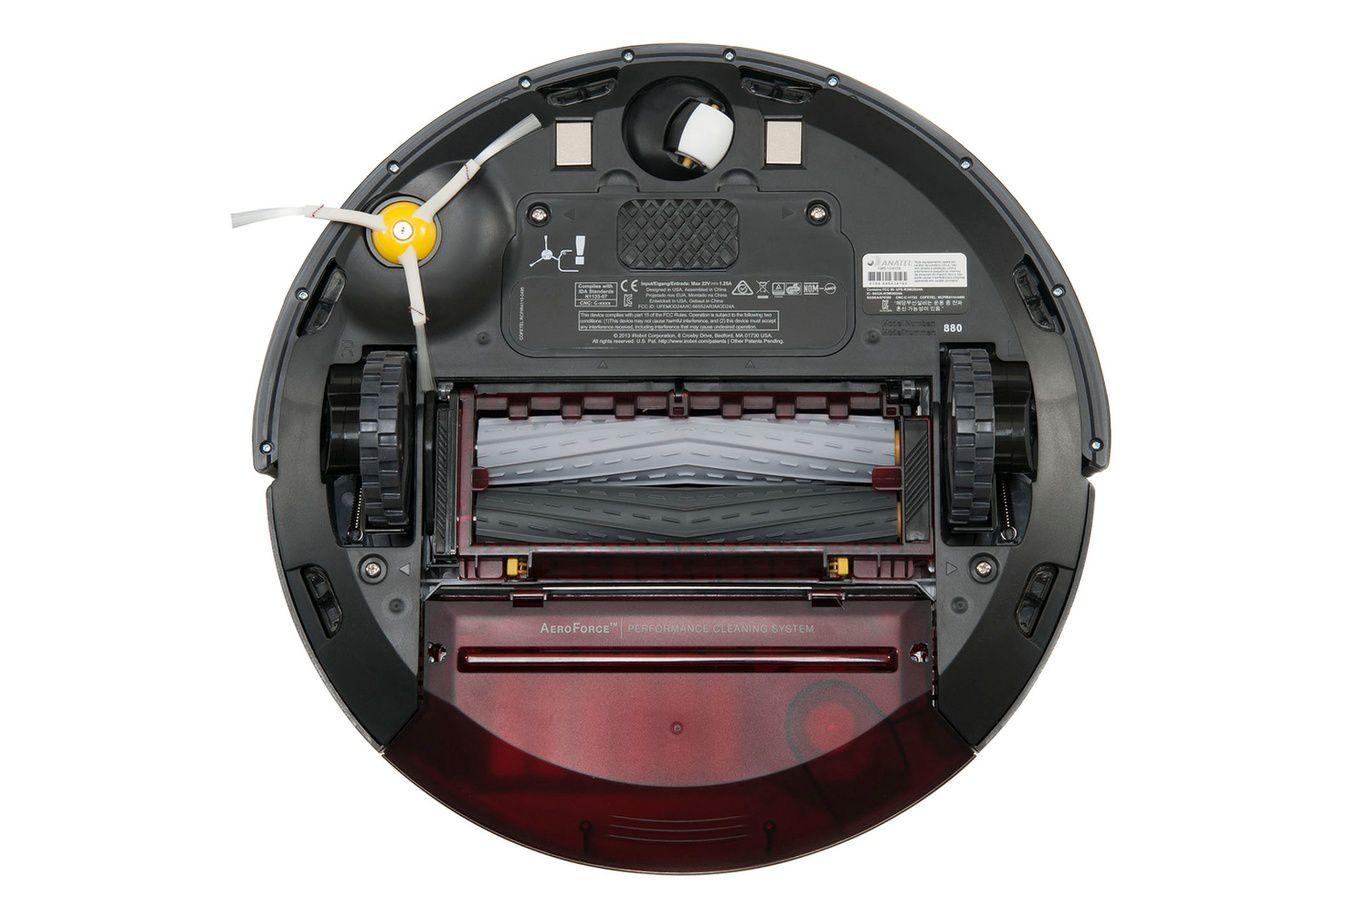 Aspirateur connecté iRobot Roomba 880 vue de bas